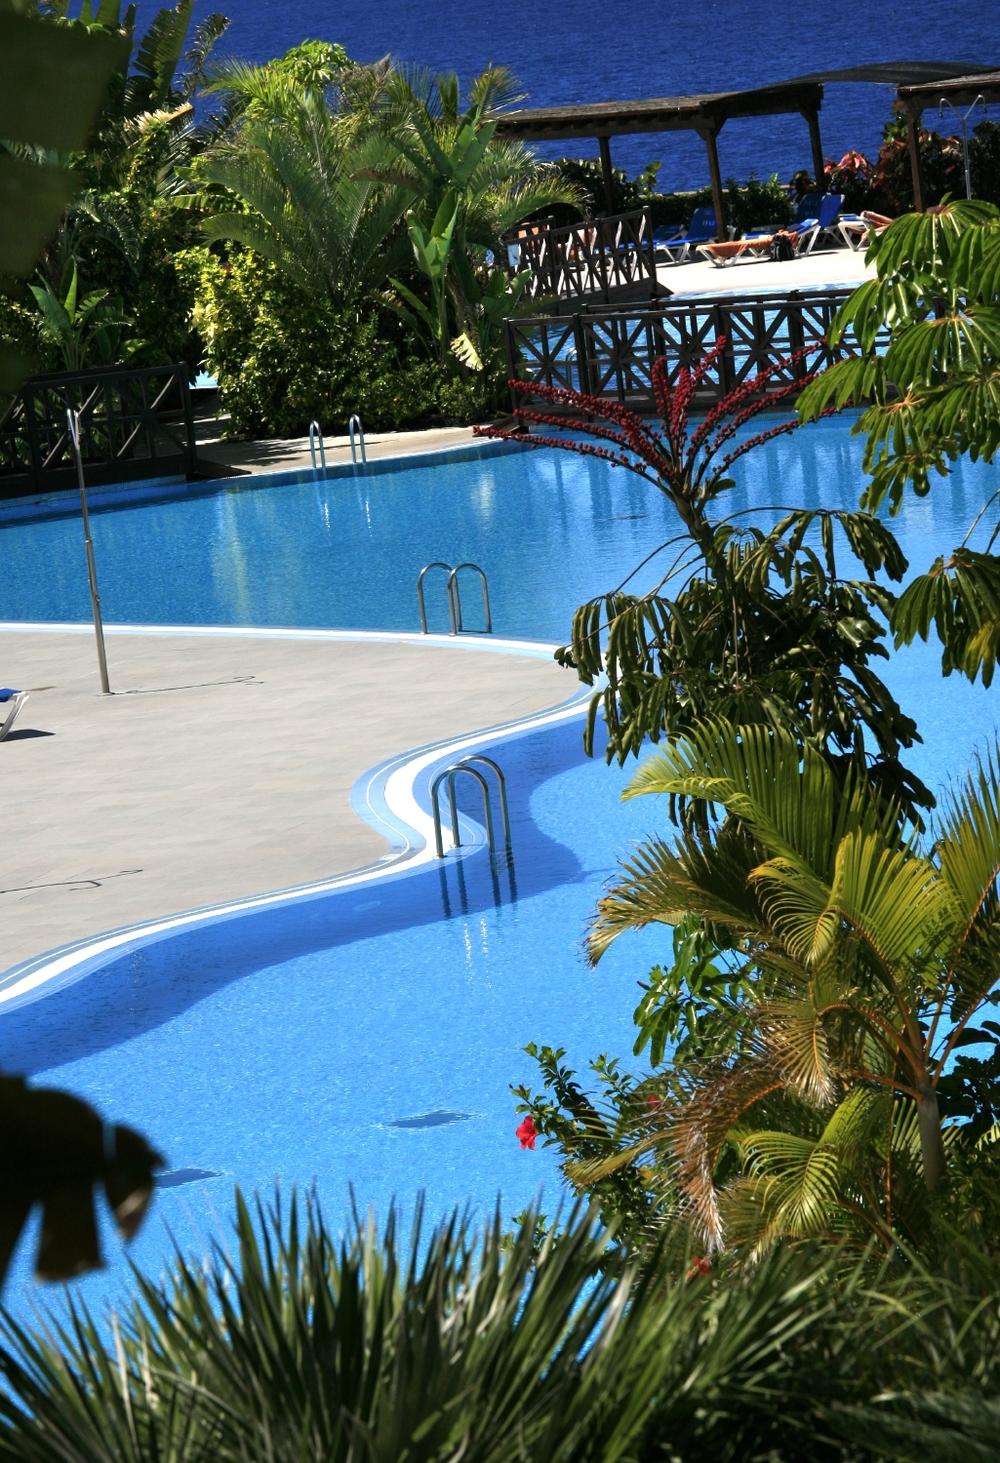 La Palma Princess Hotel & Resort, Fuencaliente, La Palma